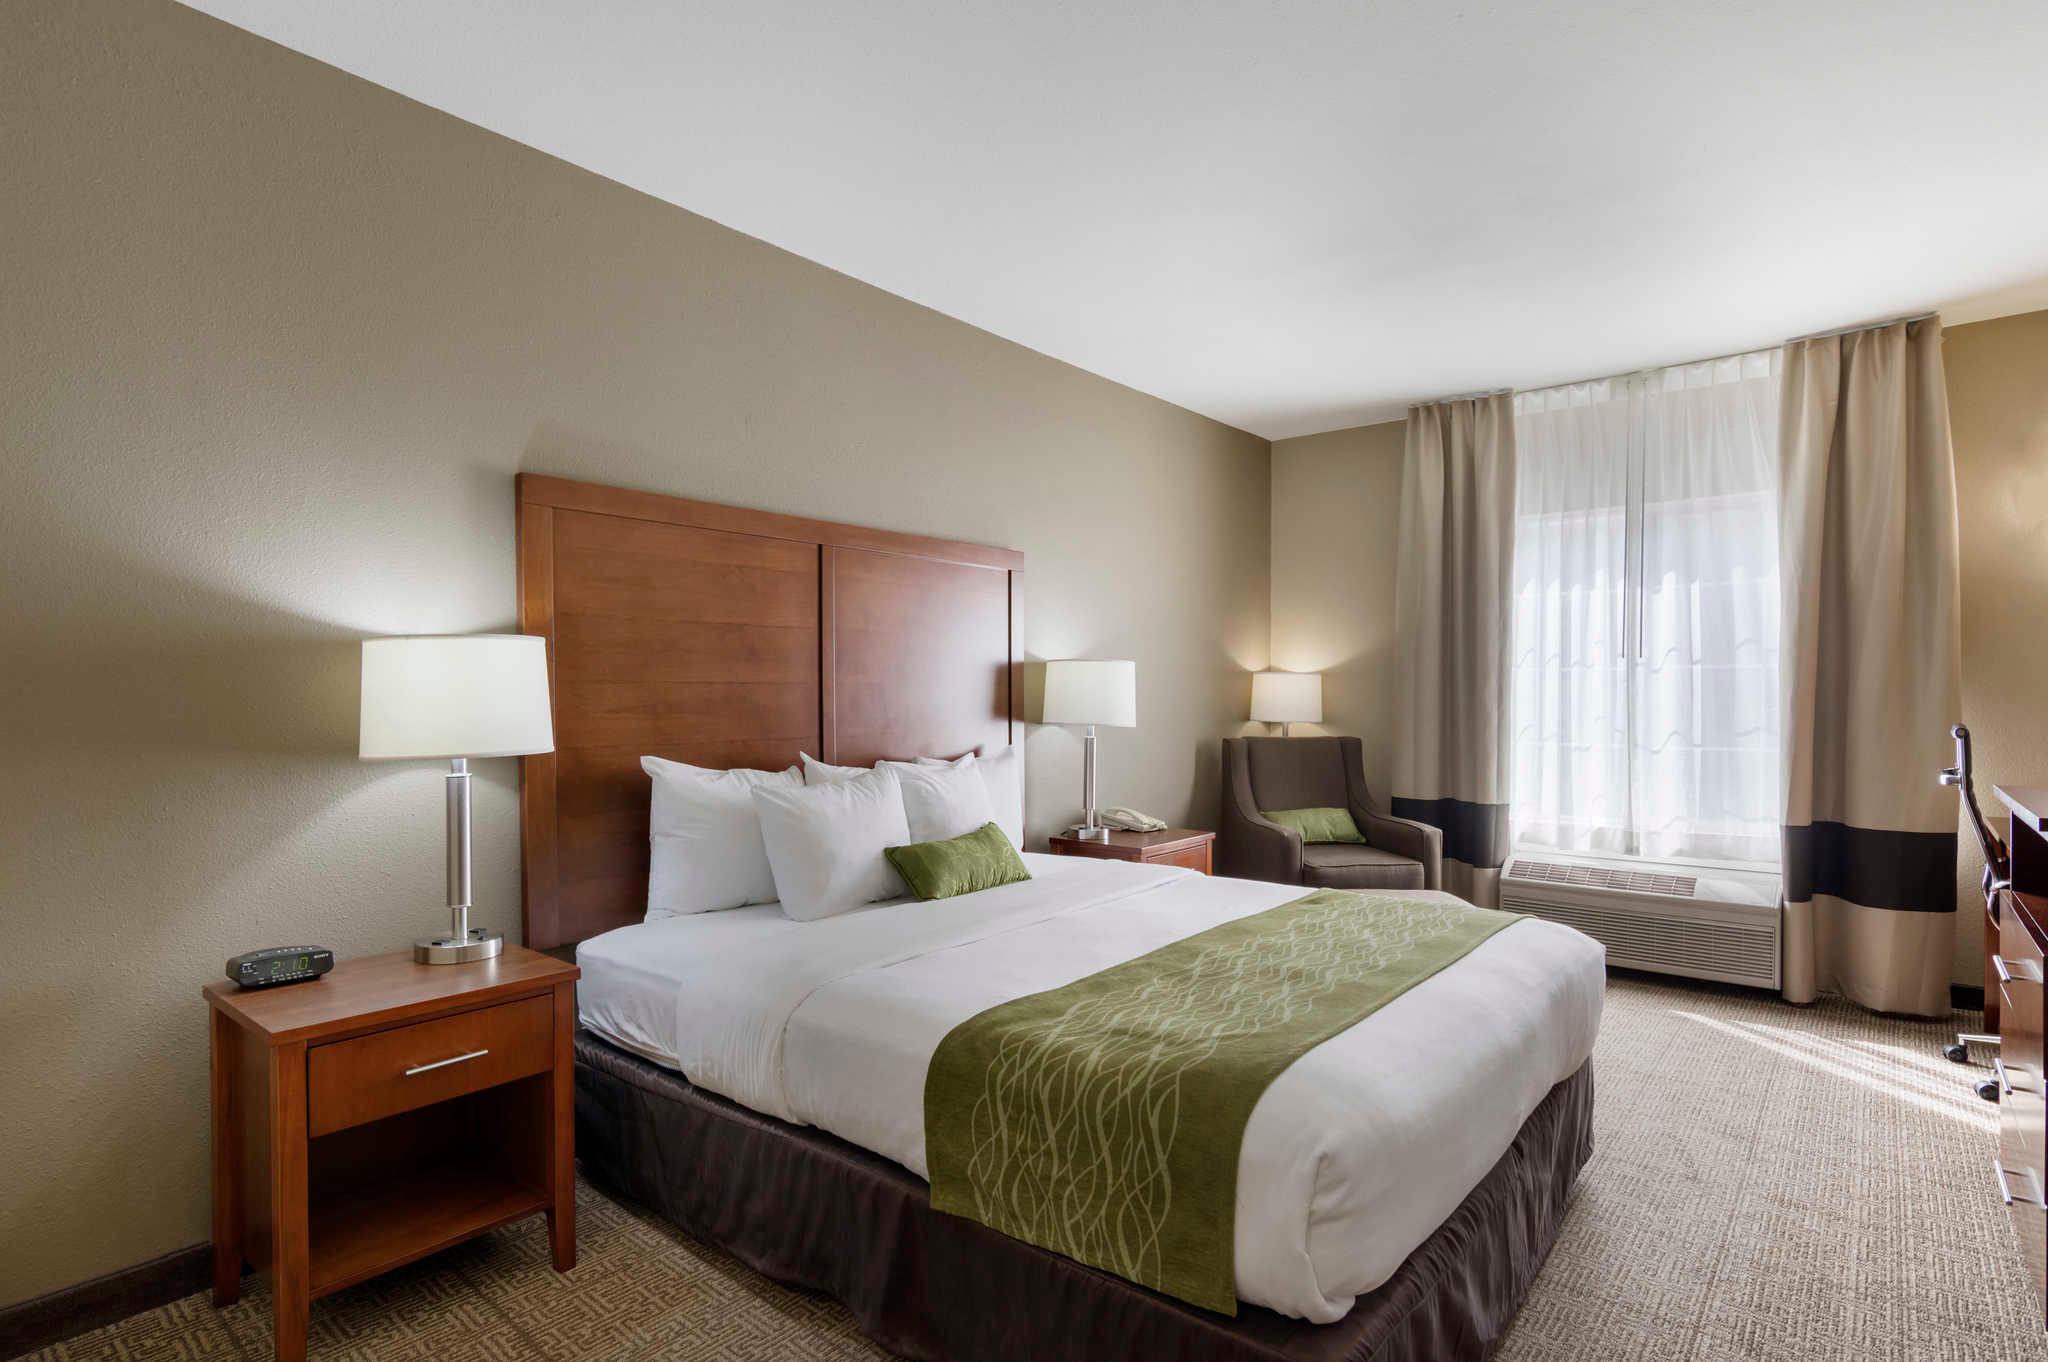 Comfort Inn & Suites Sacramento - University Area image 0